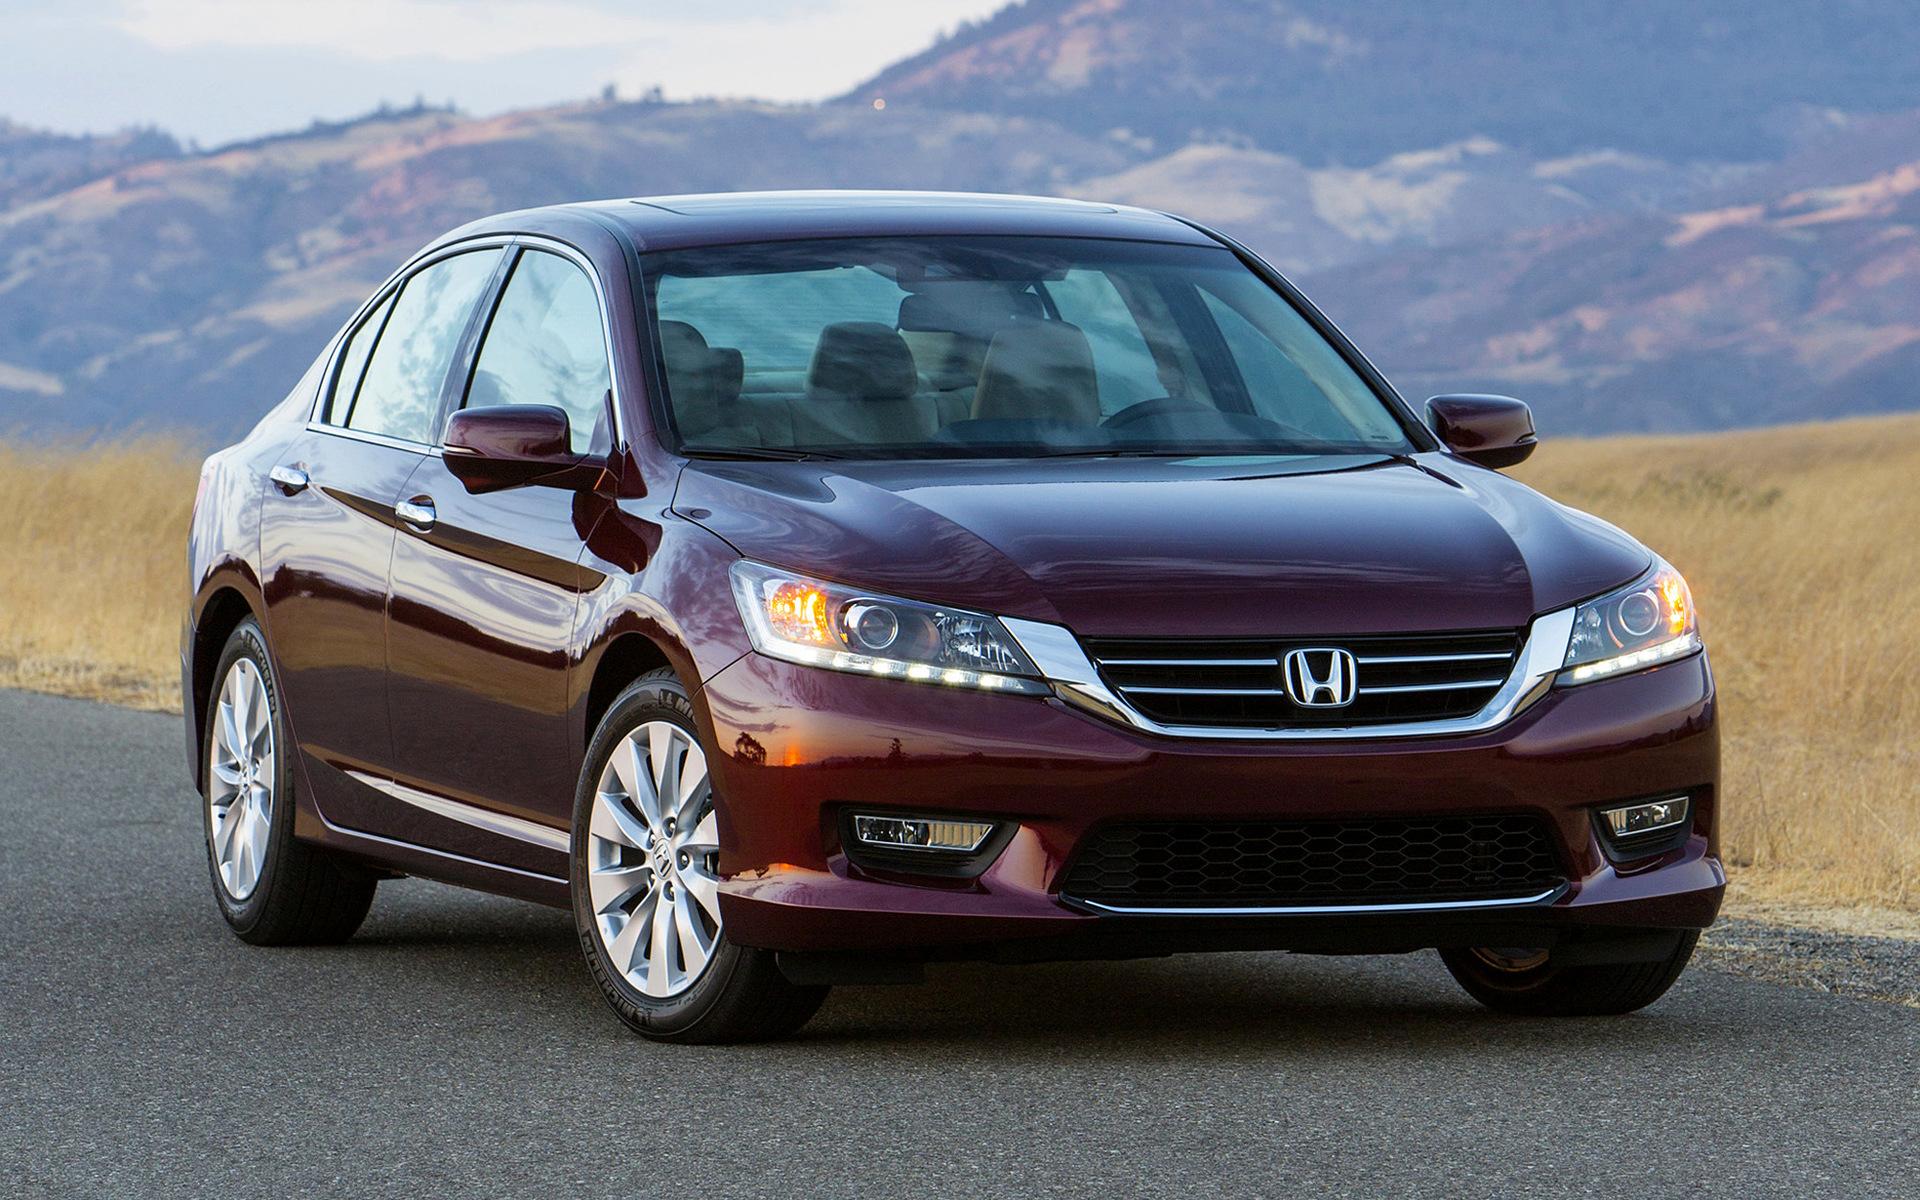 Honda Accord Ex L V6 Sedan 2012 Wallpapers And Hd Images